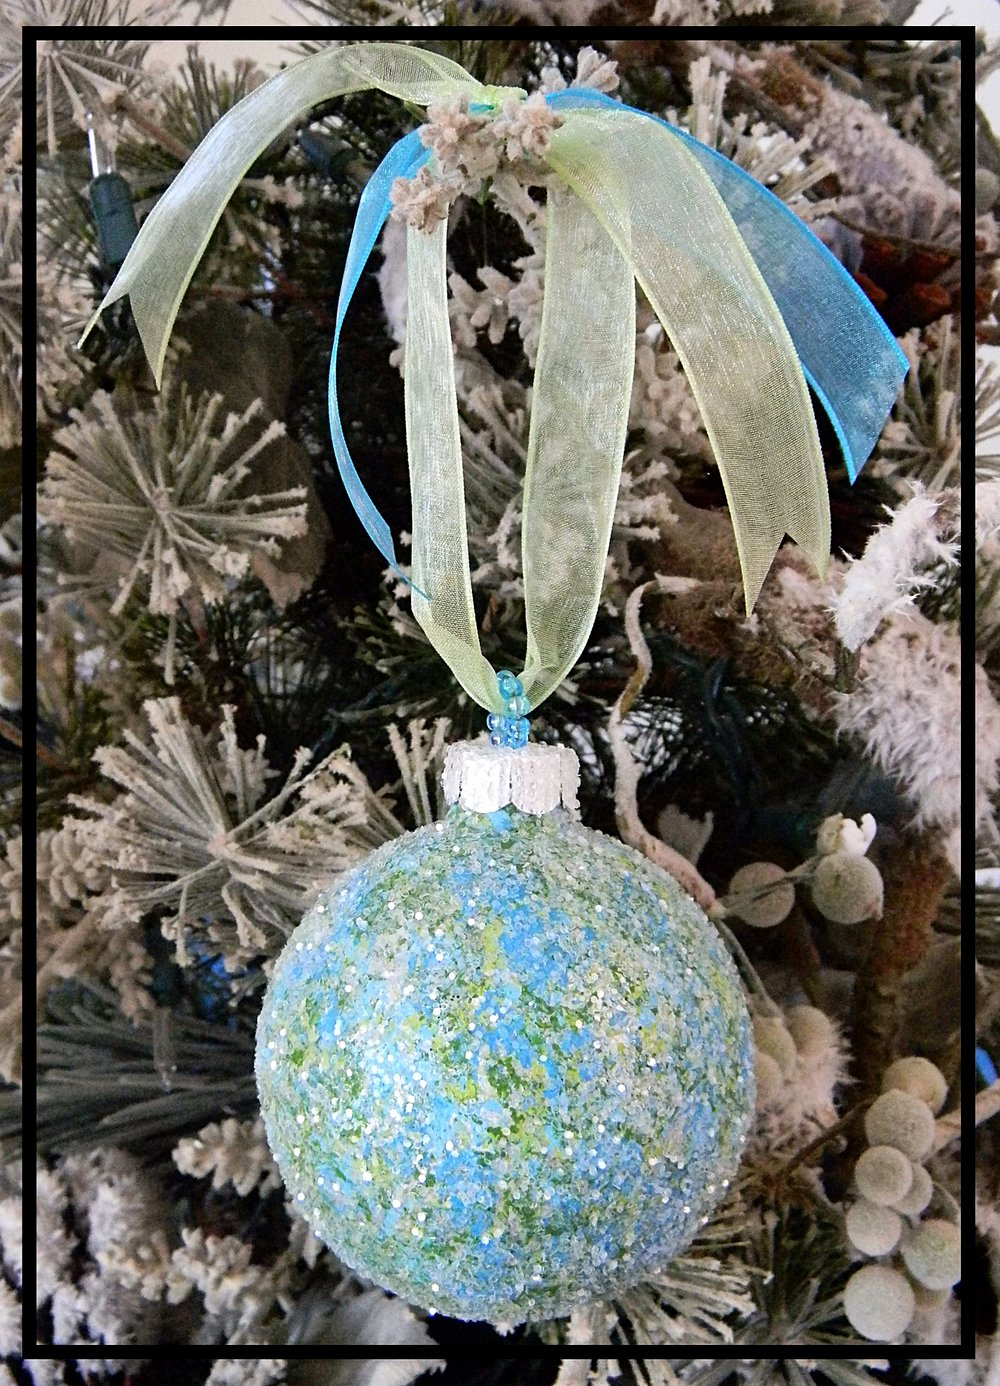 Hand Painted Christmas Ornament Green Blue Silver Sugar Creek Home Decor